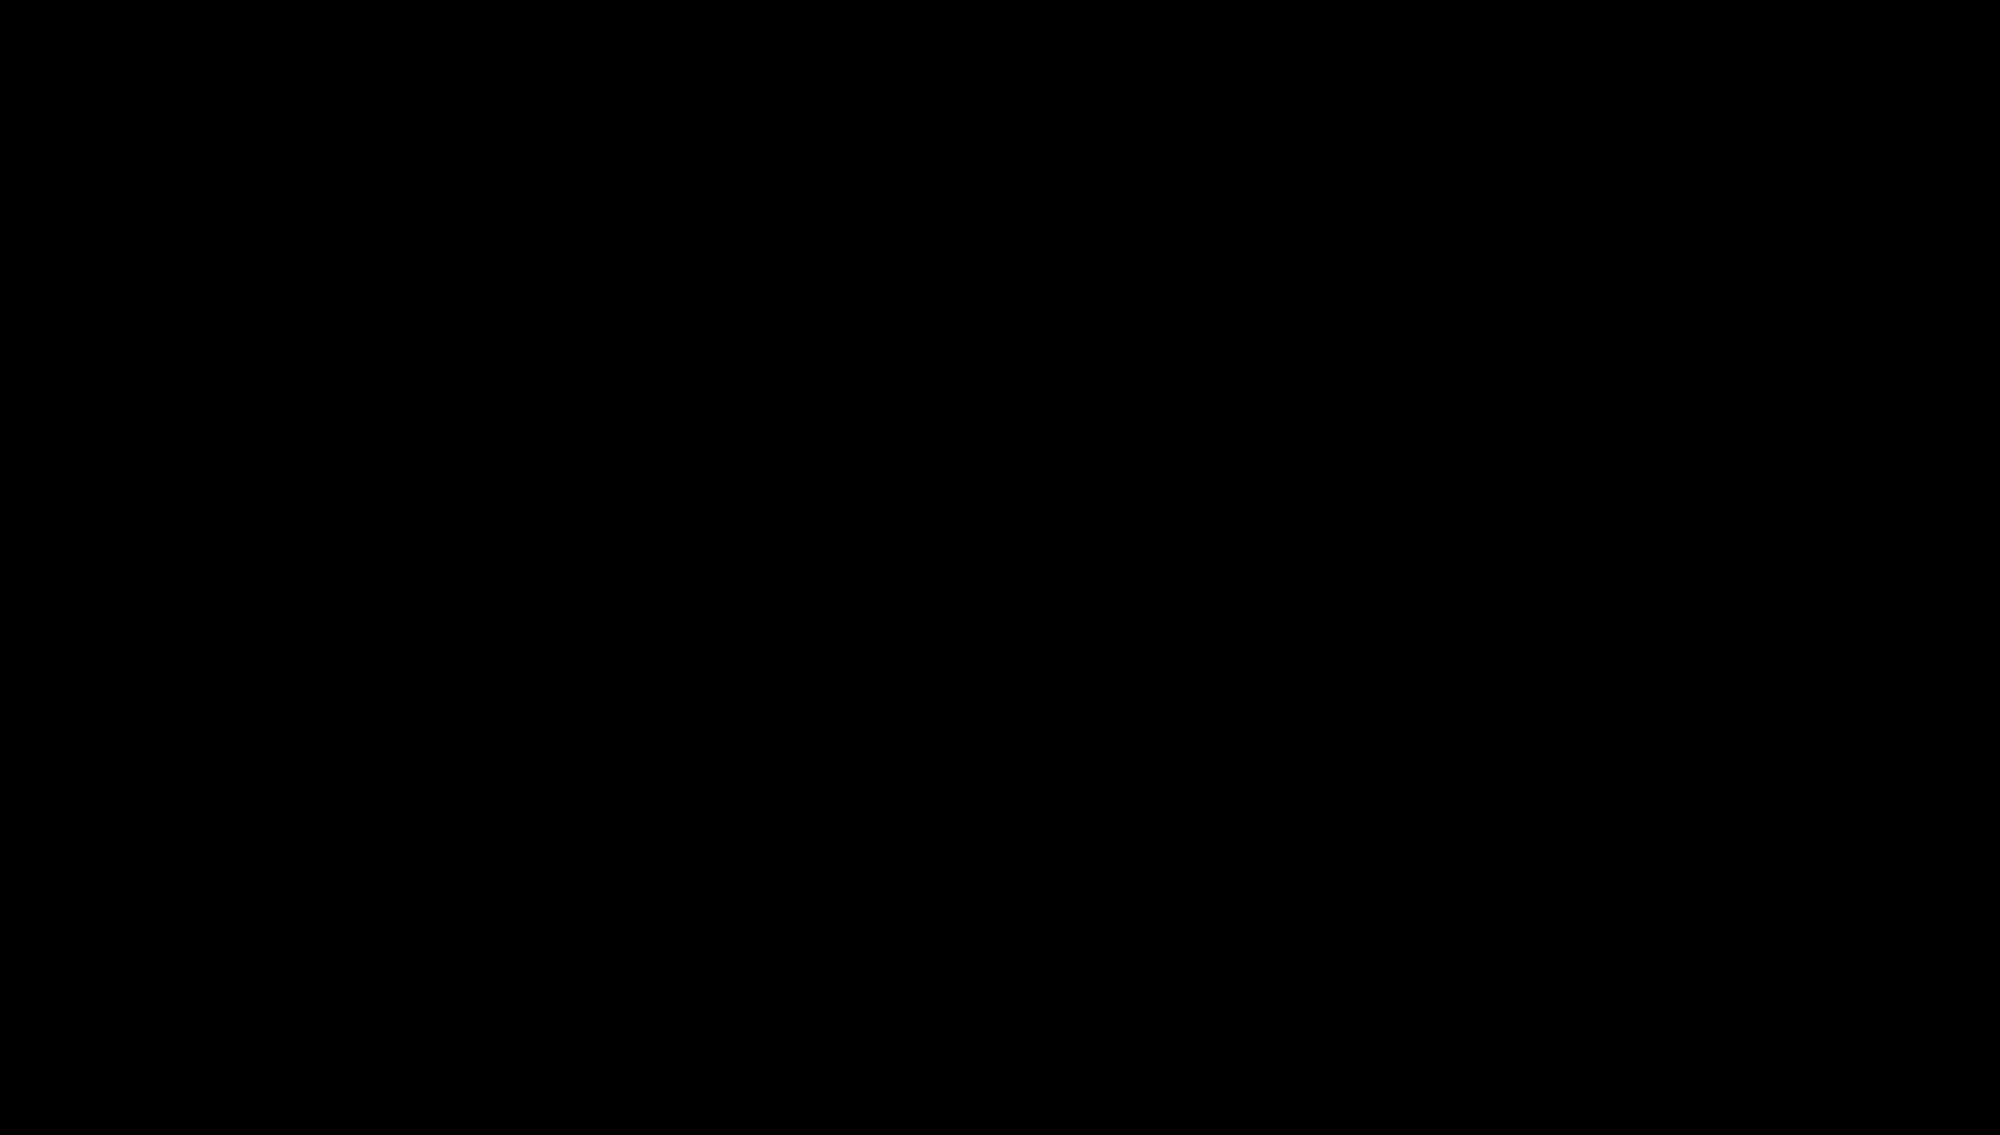 Scuba Diver Silhouette Clip Art